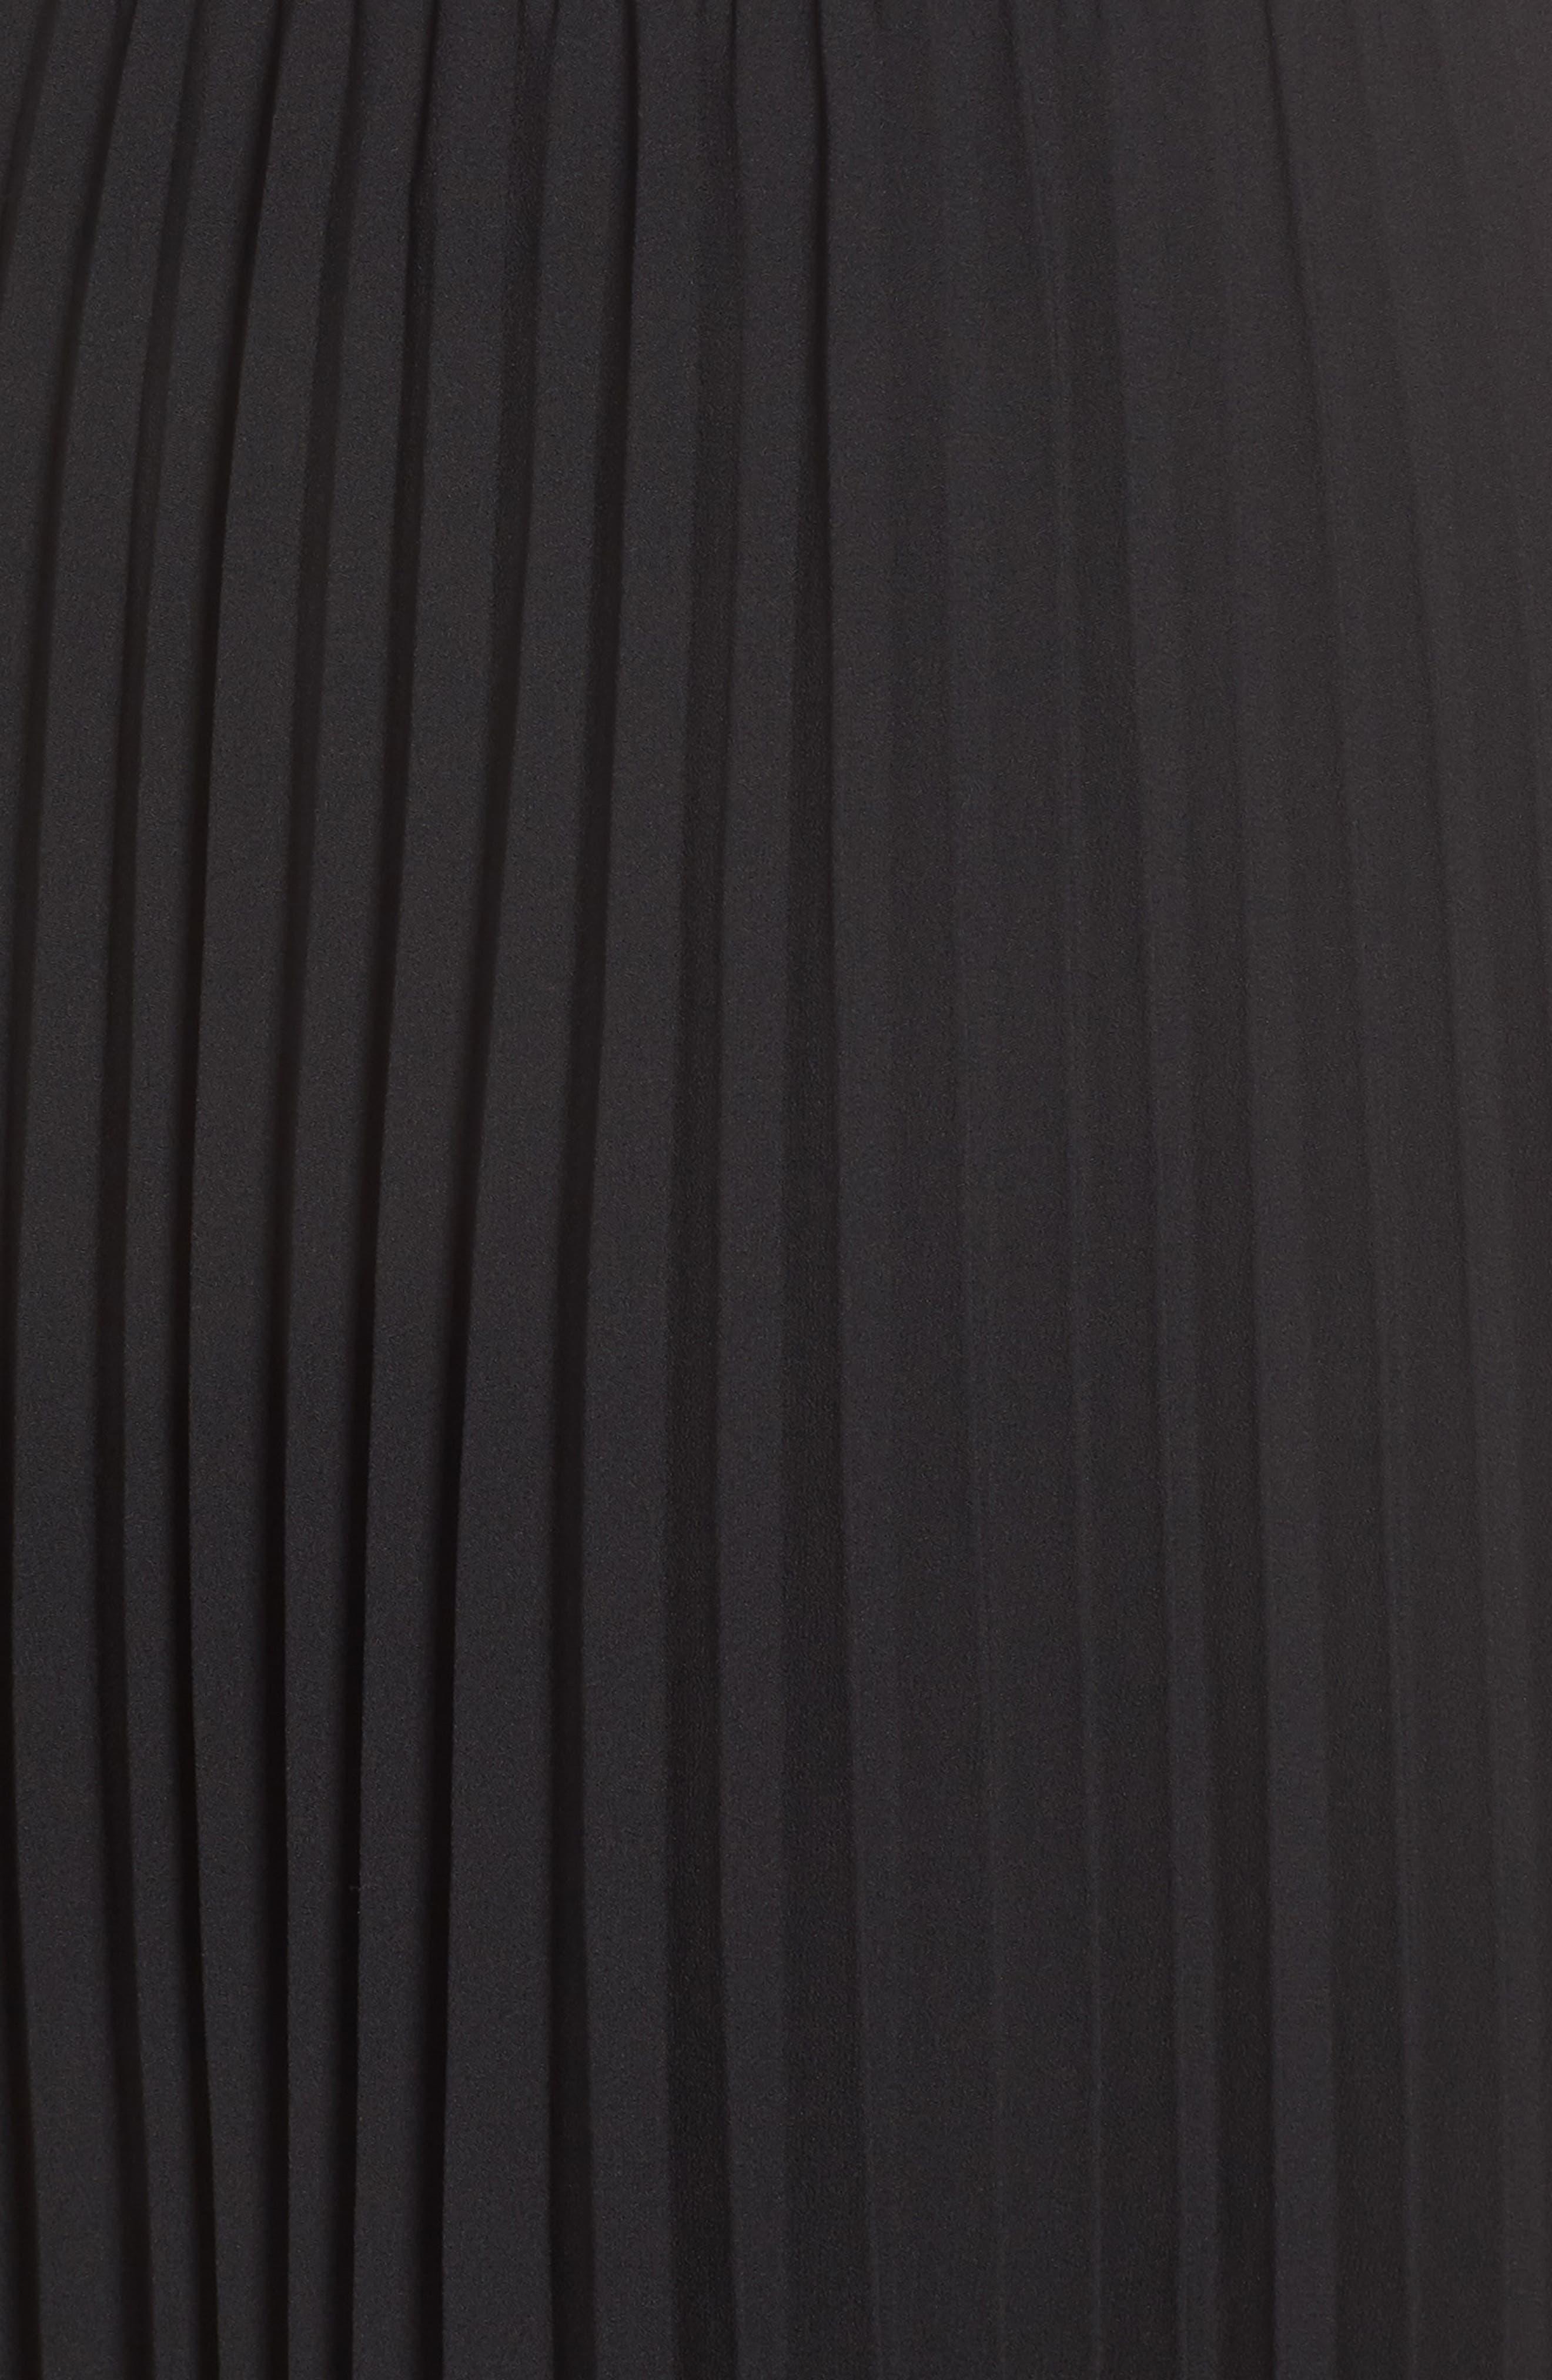 ALI & JAY, Angles Flight Chiffon Fit & Flare Dress, Alternate thumbnail 6, color, BLACK